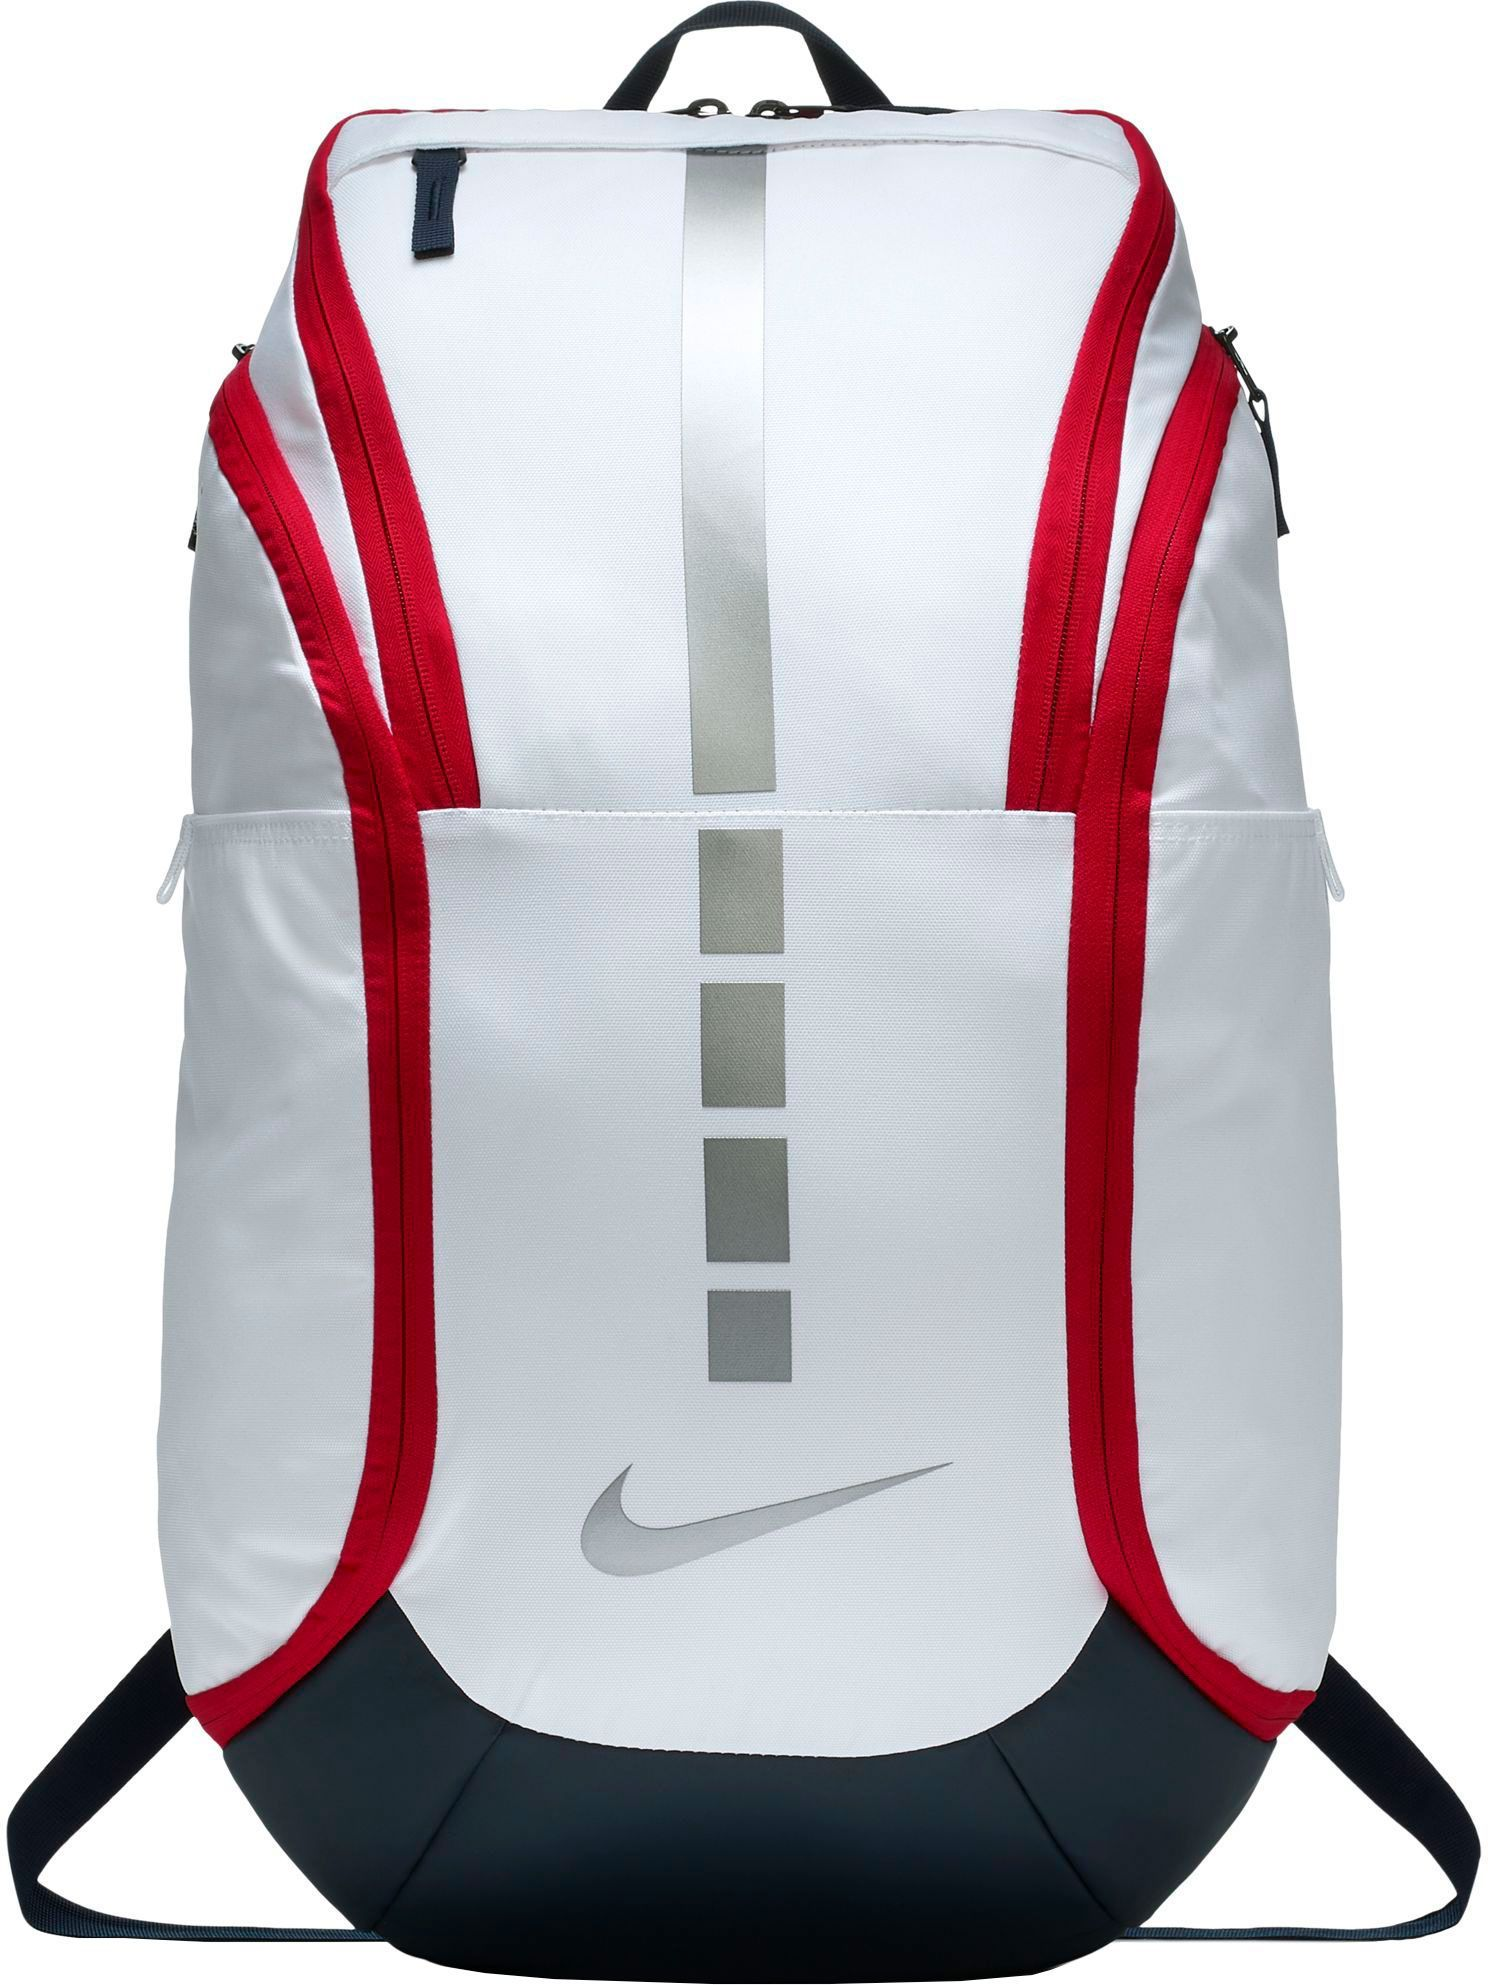 Nike Hoops Elite Pro Basketball Backpack in 2020 Nike